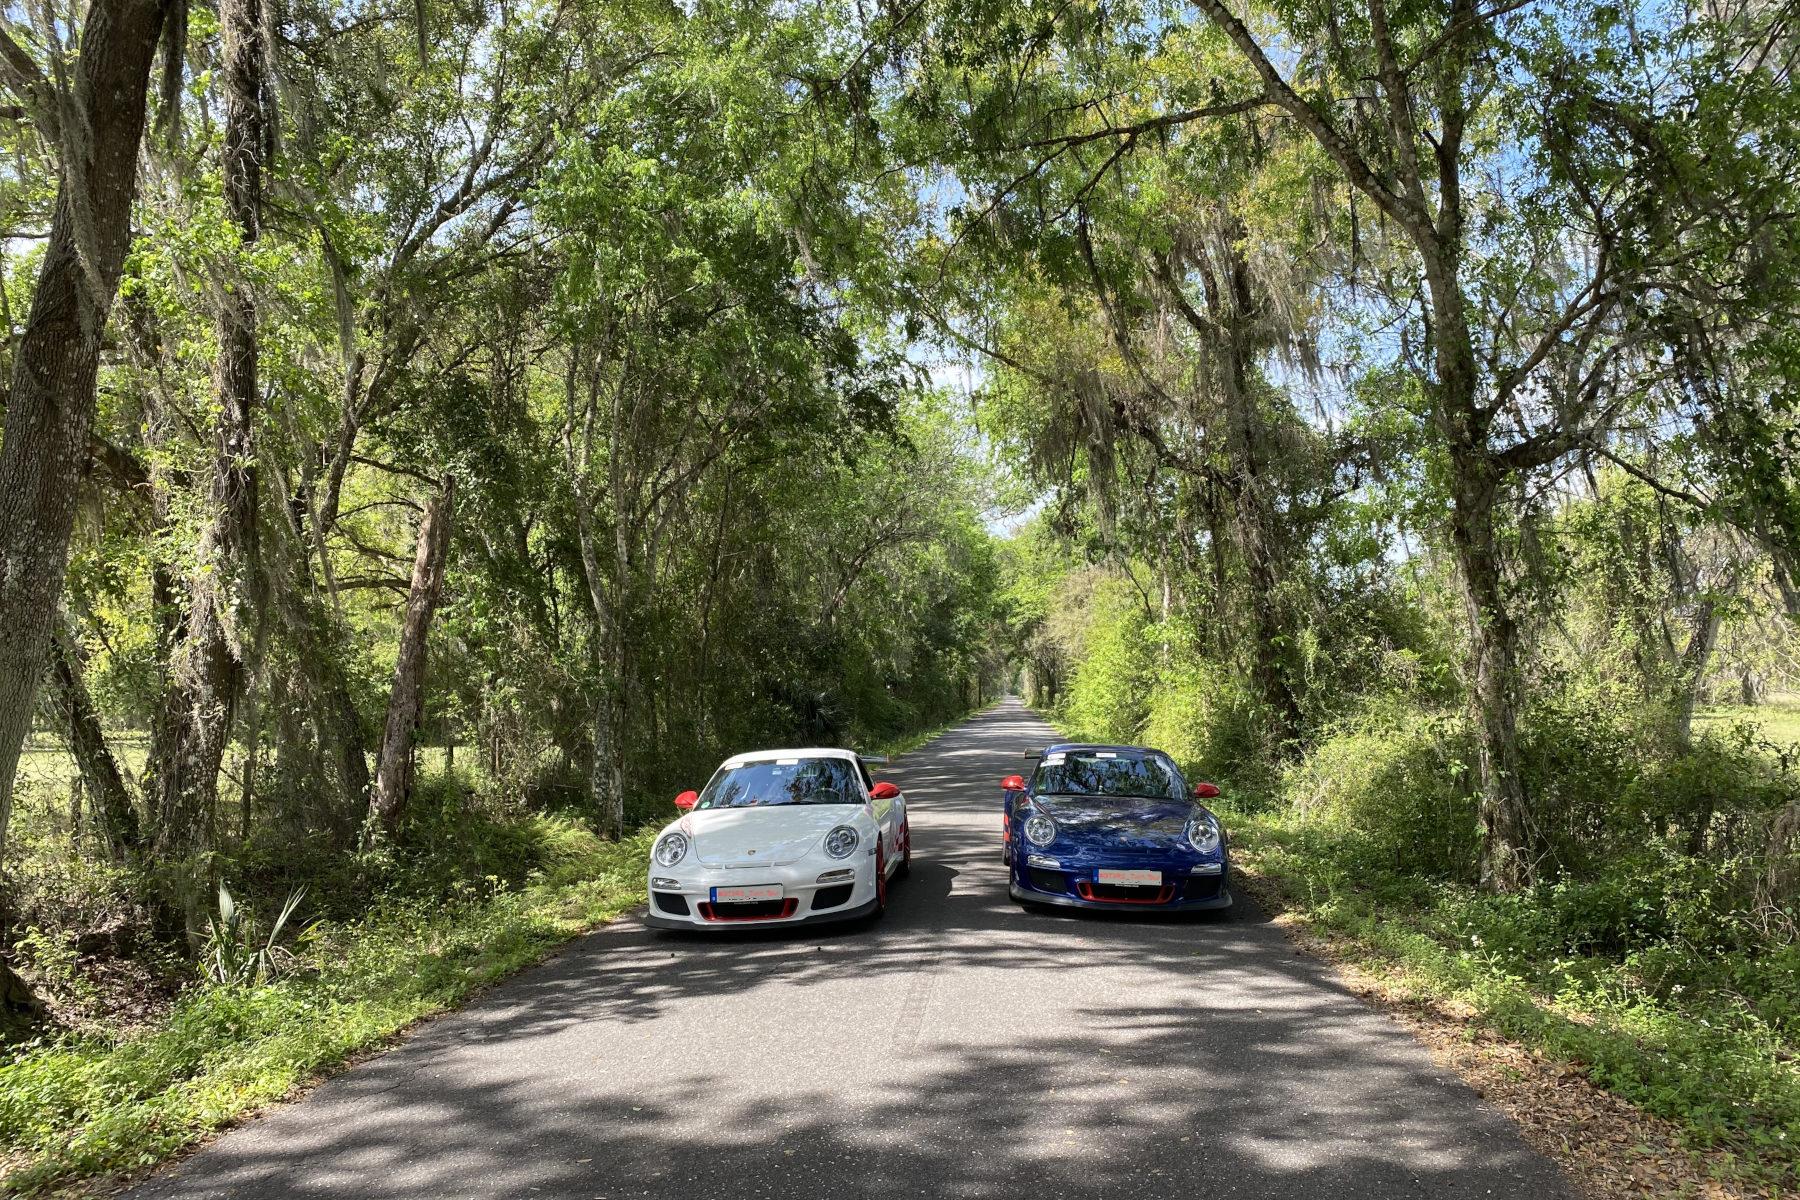 911 GT3 RS under live oaks